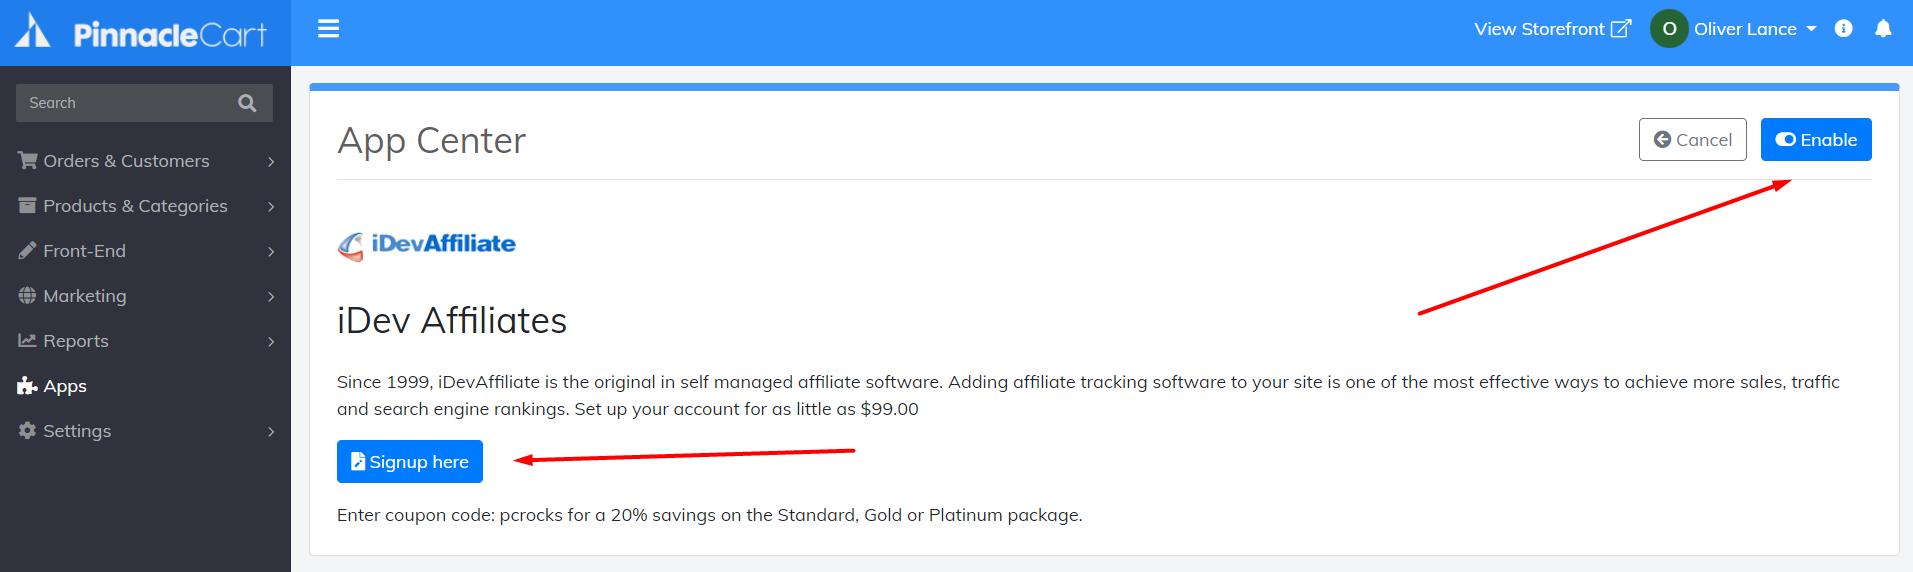 idevaffiliate app settings